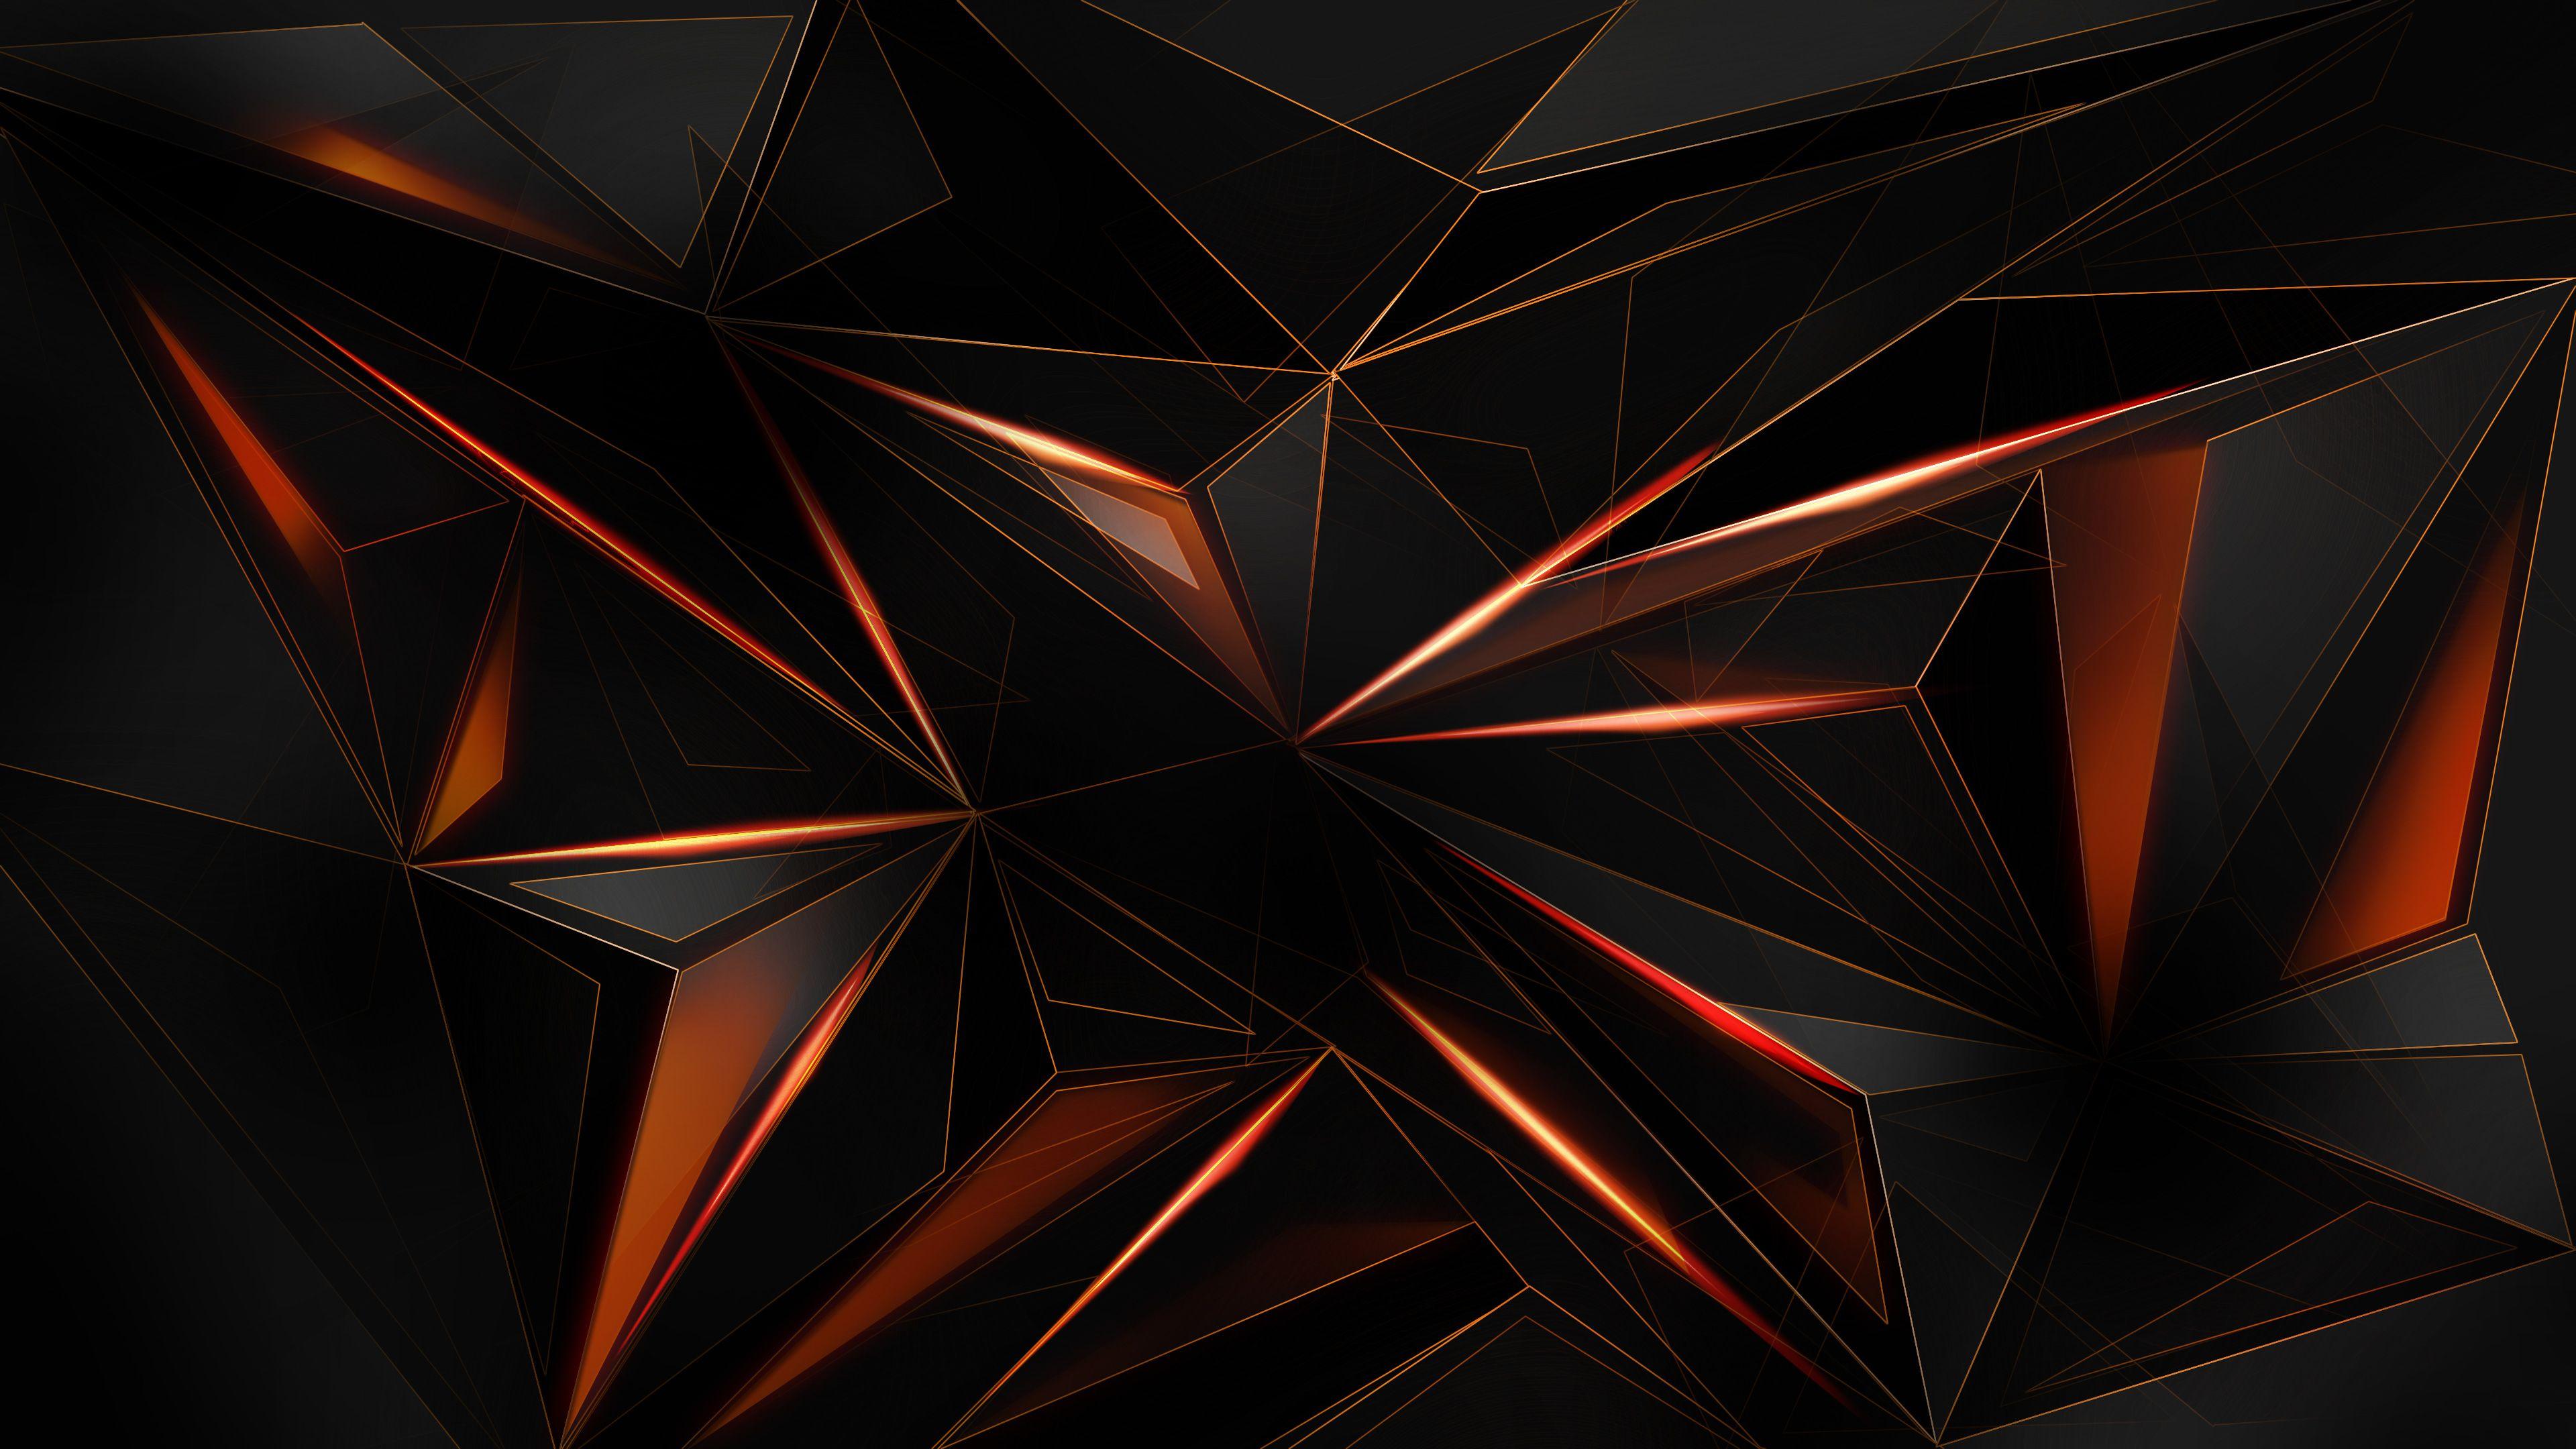 Abstract Shapes Polygon Hd 4k Deviantart Abstract Abstract Wallpaper Abstract Shapes